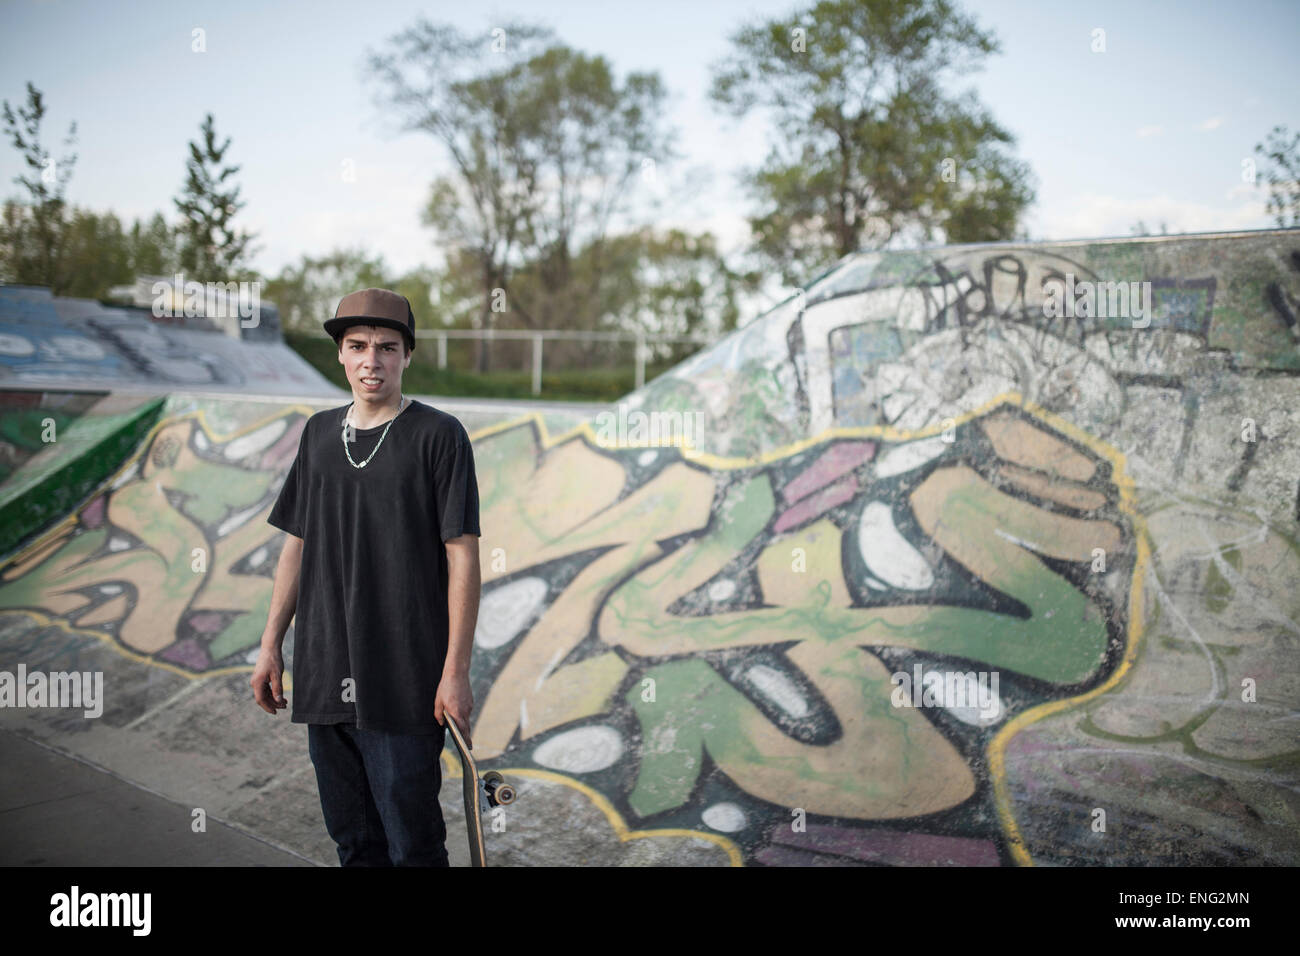 Caucasian man standing at skate park - Stock Image